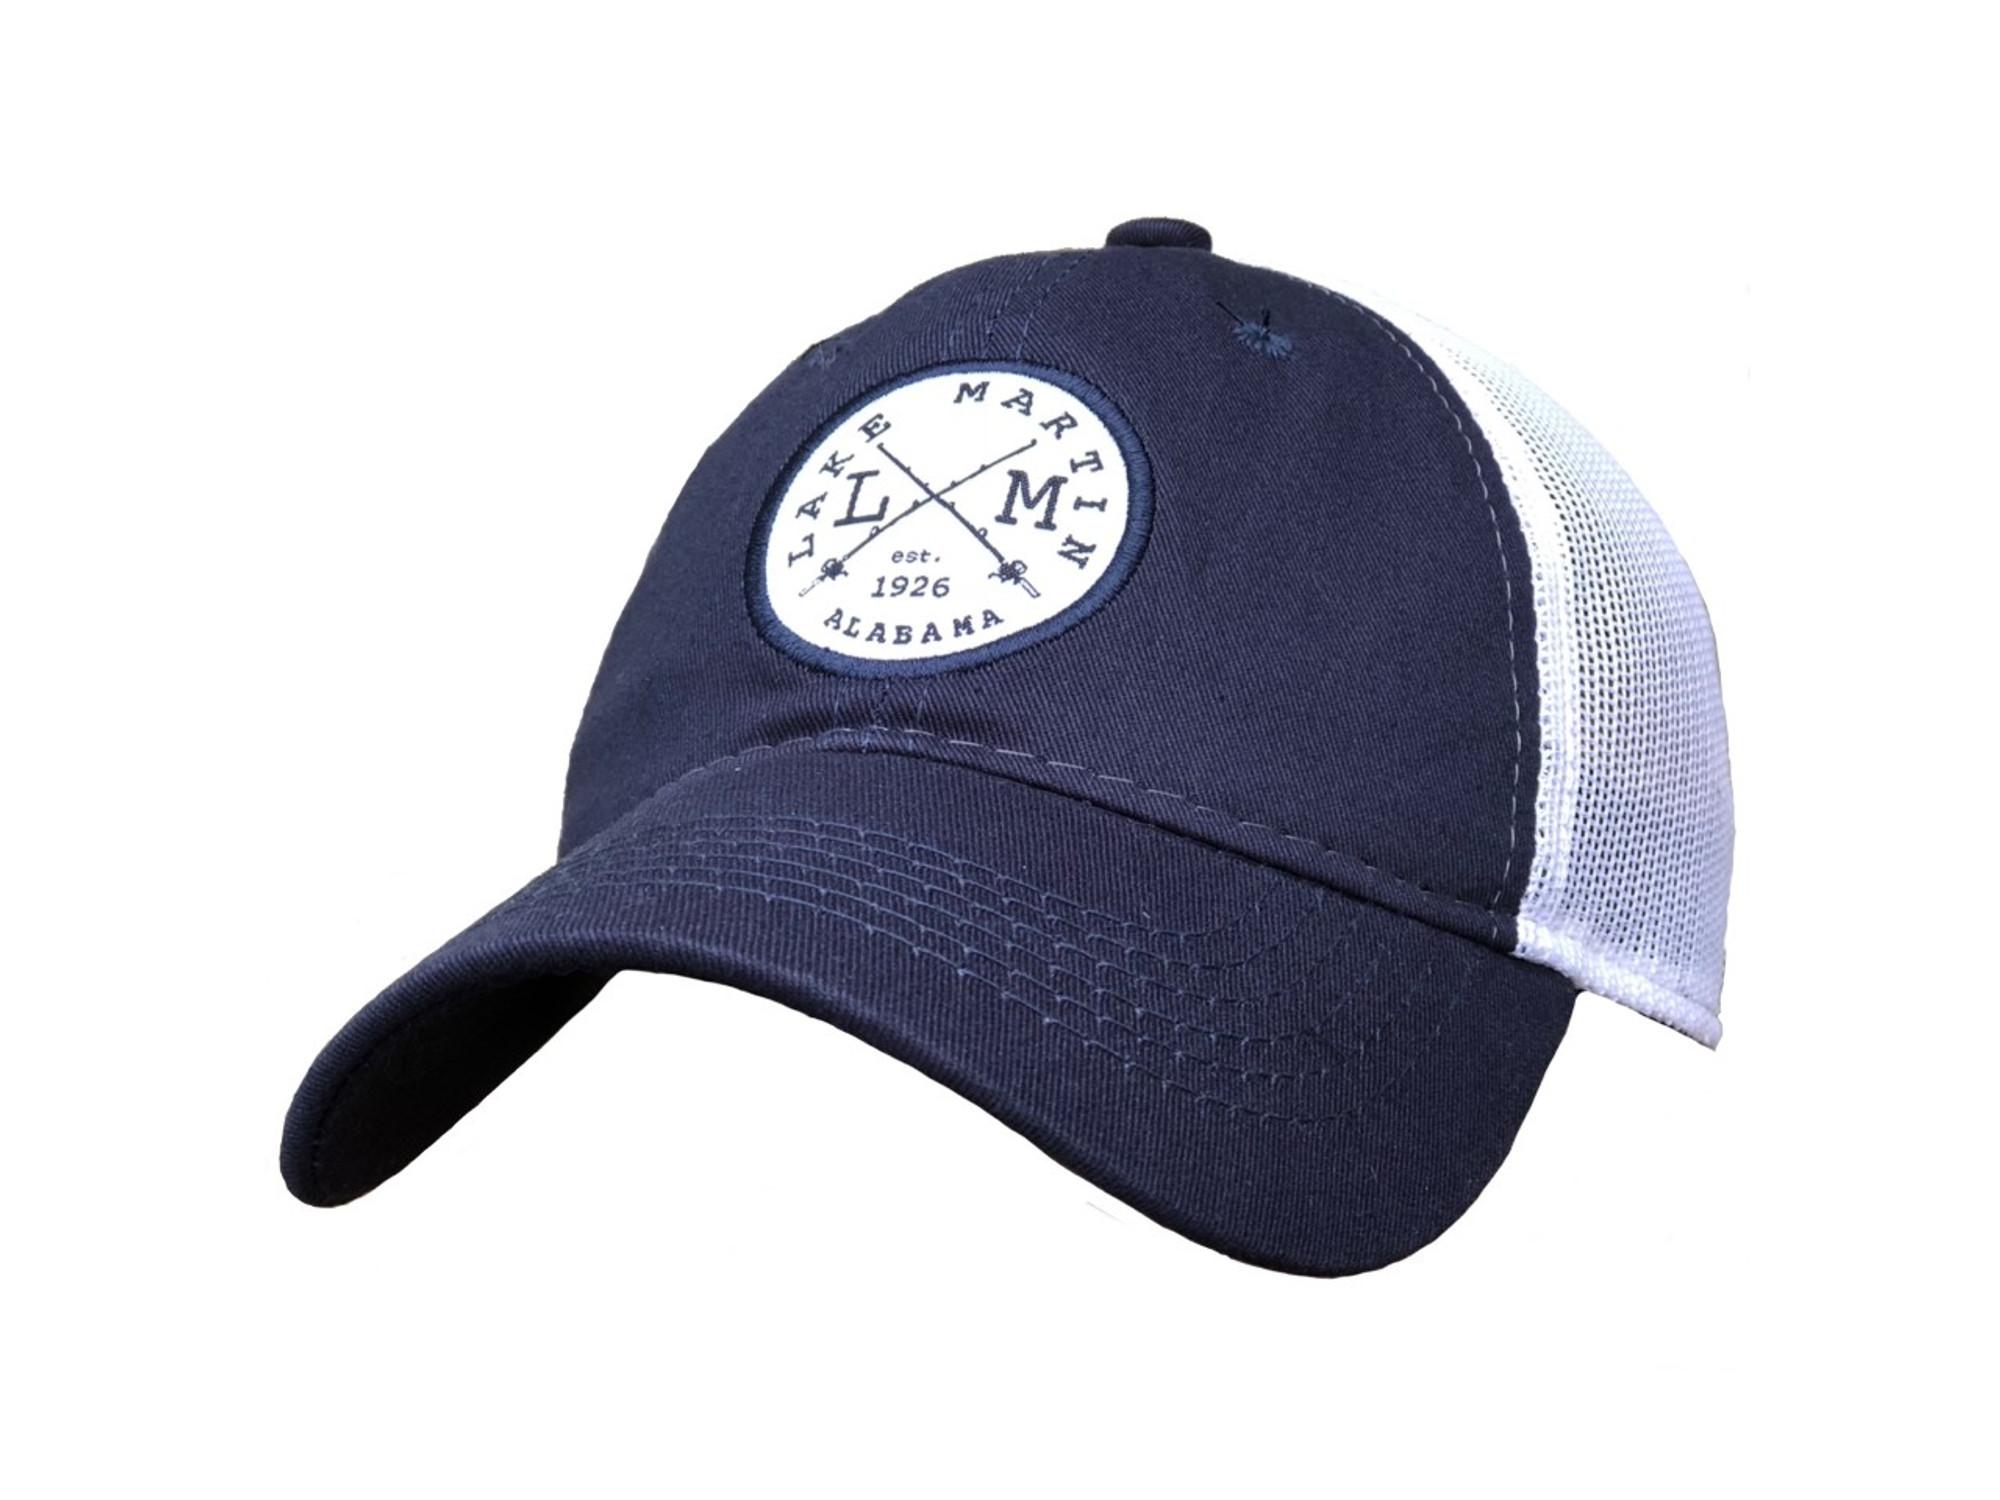 58a7a65f0 Lake Martin Navy Blue Mesh Trucker Hat